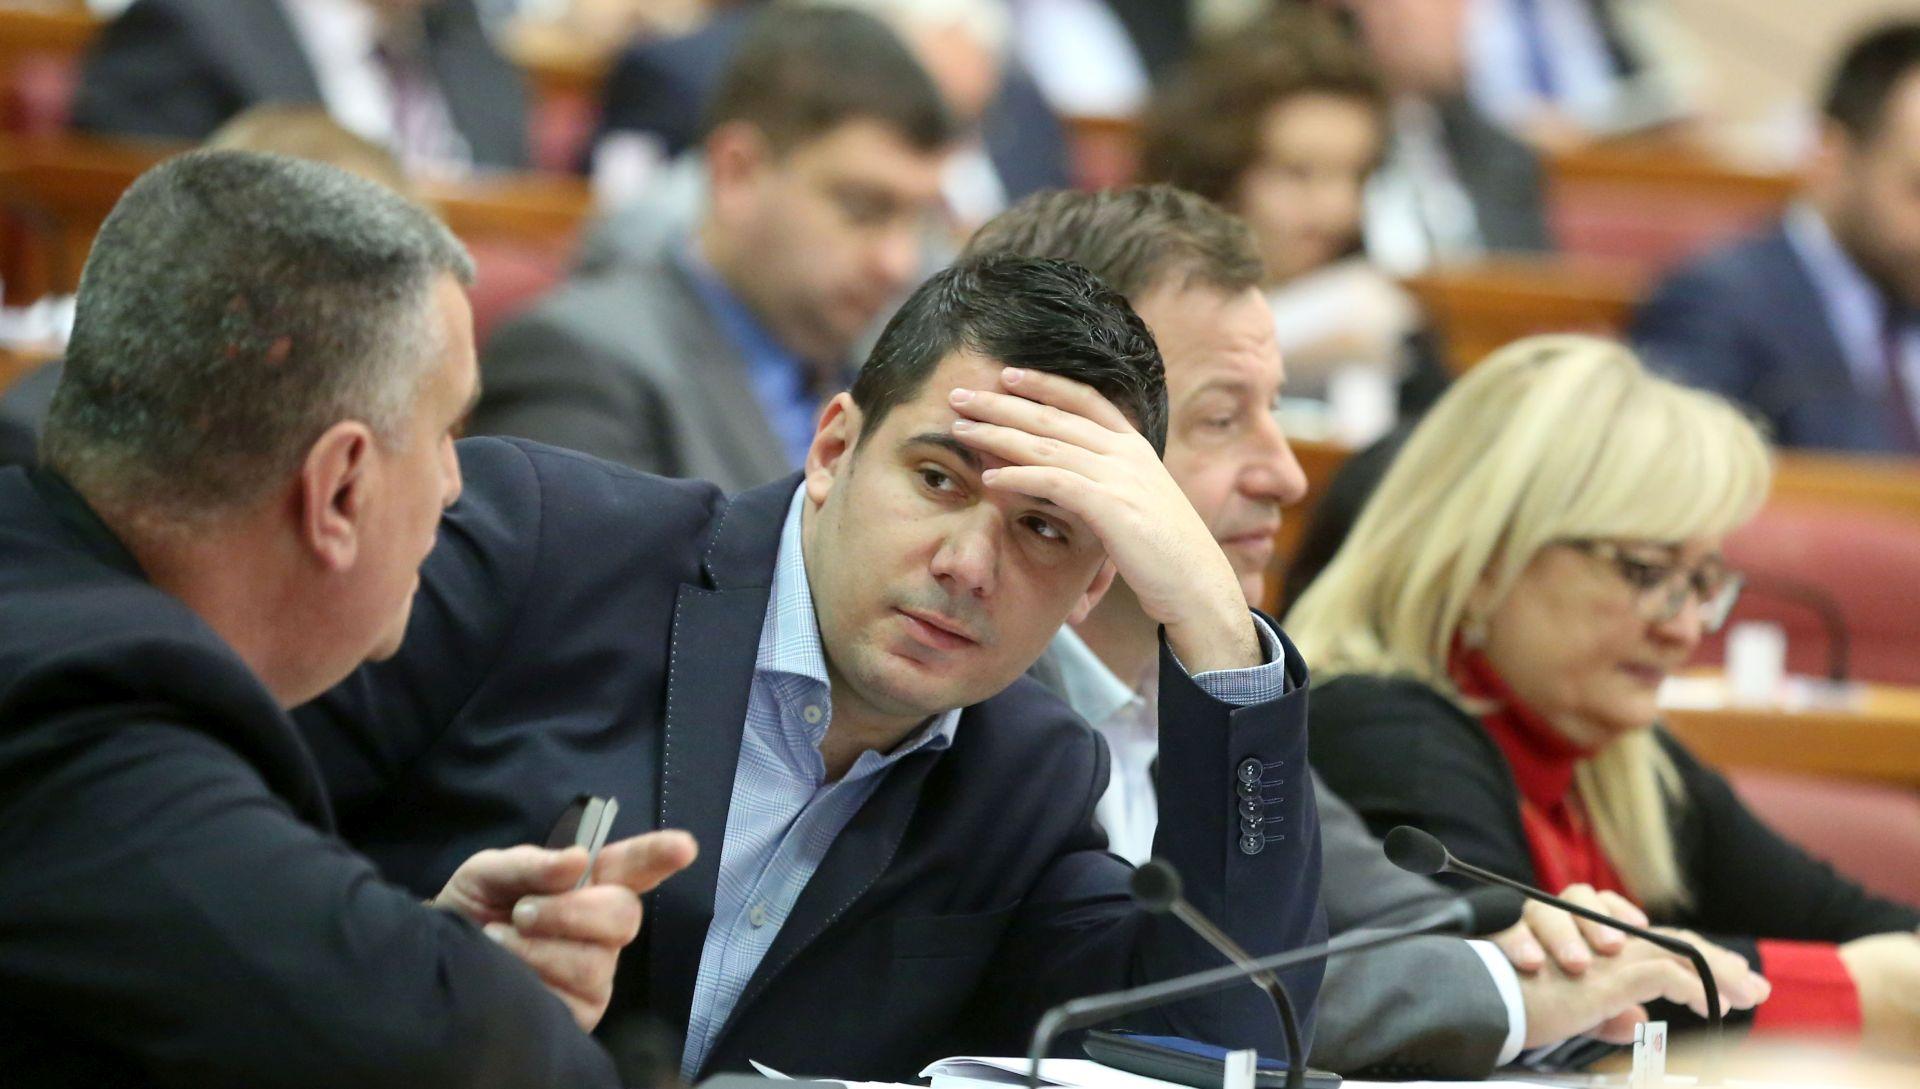 Sabor donio Zakon o OPG-u; HSS i Most napustili sabornicu